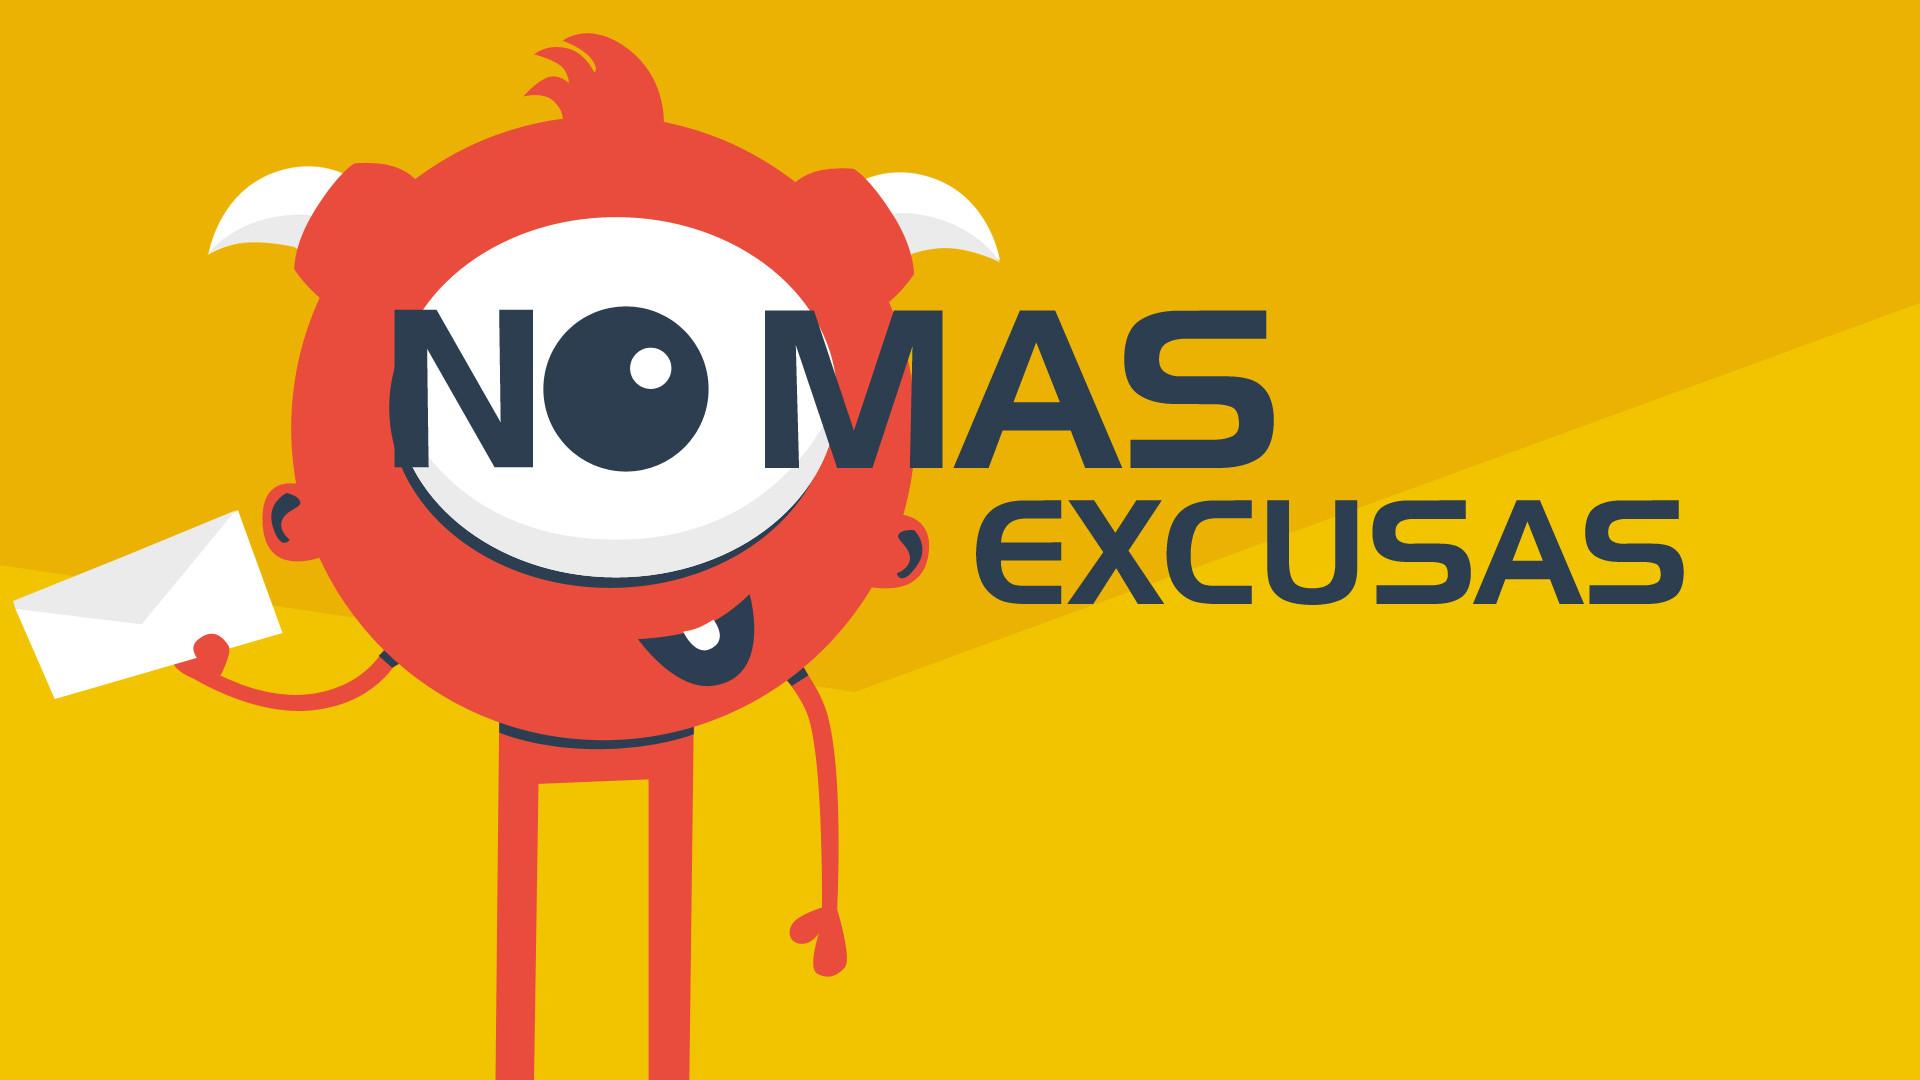 NoMasEscusas-Title.jpg